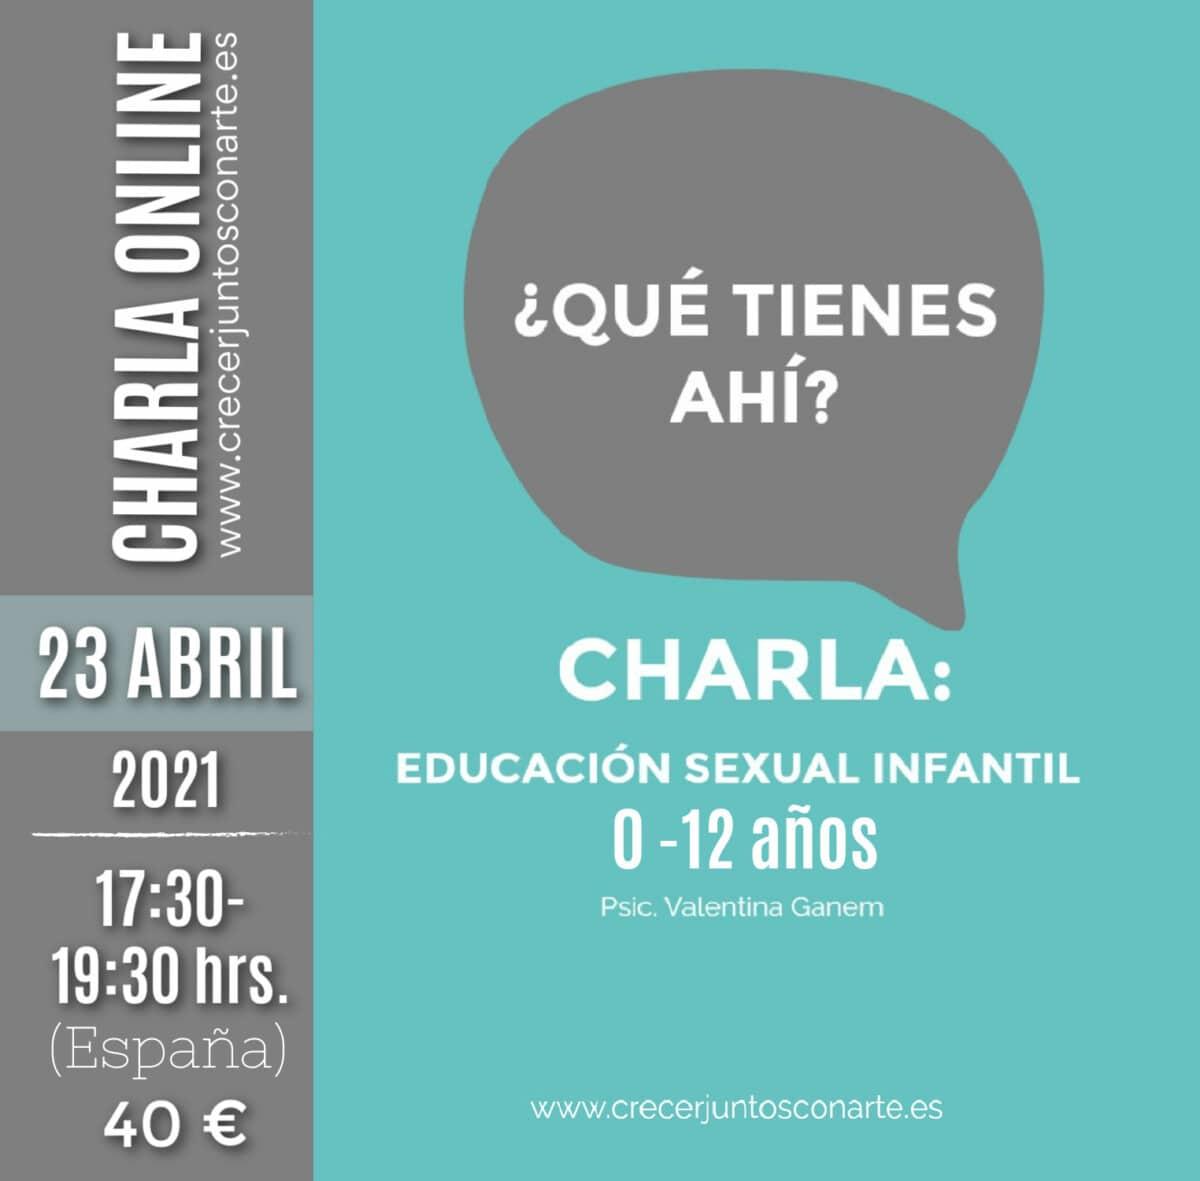 charla educacion sexual infantil